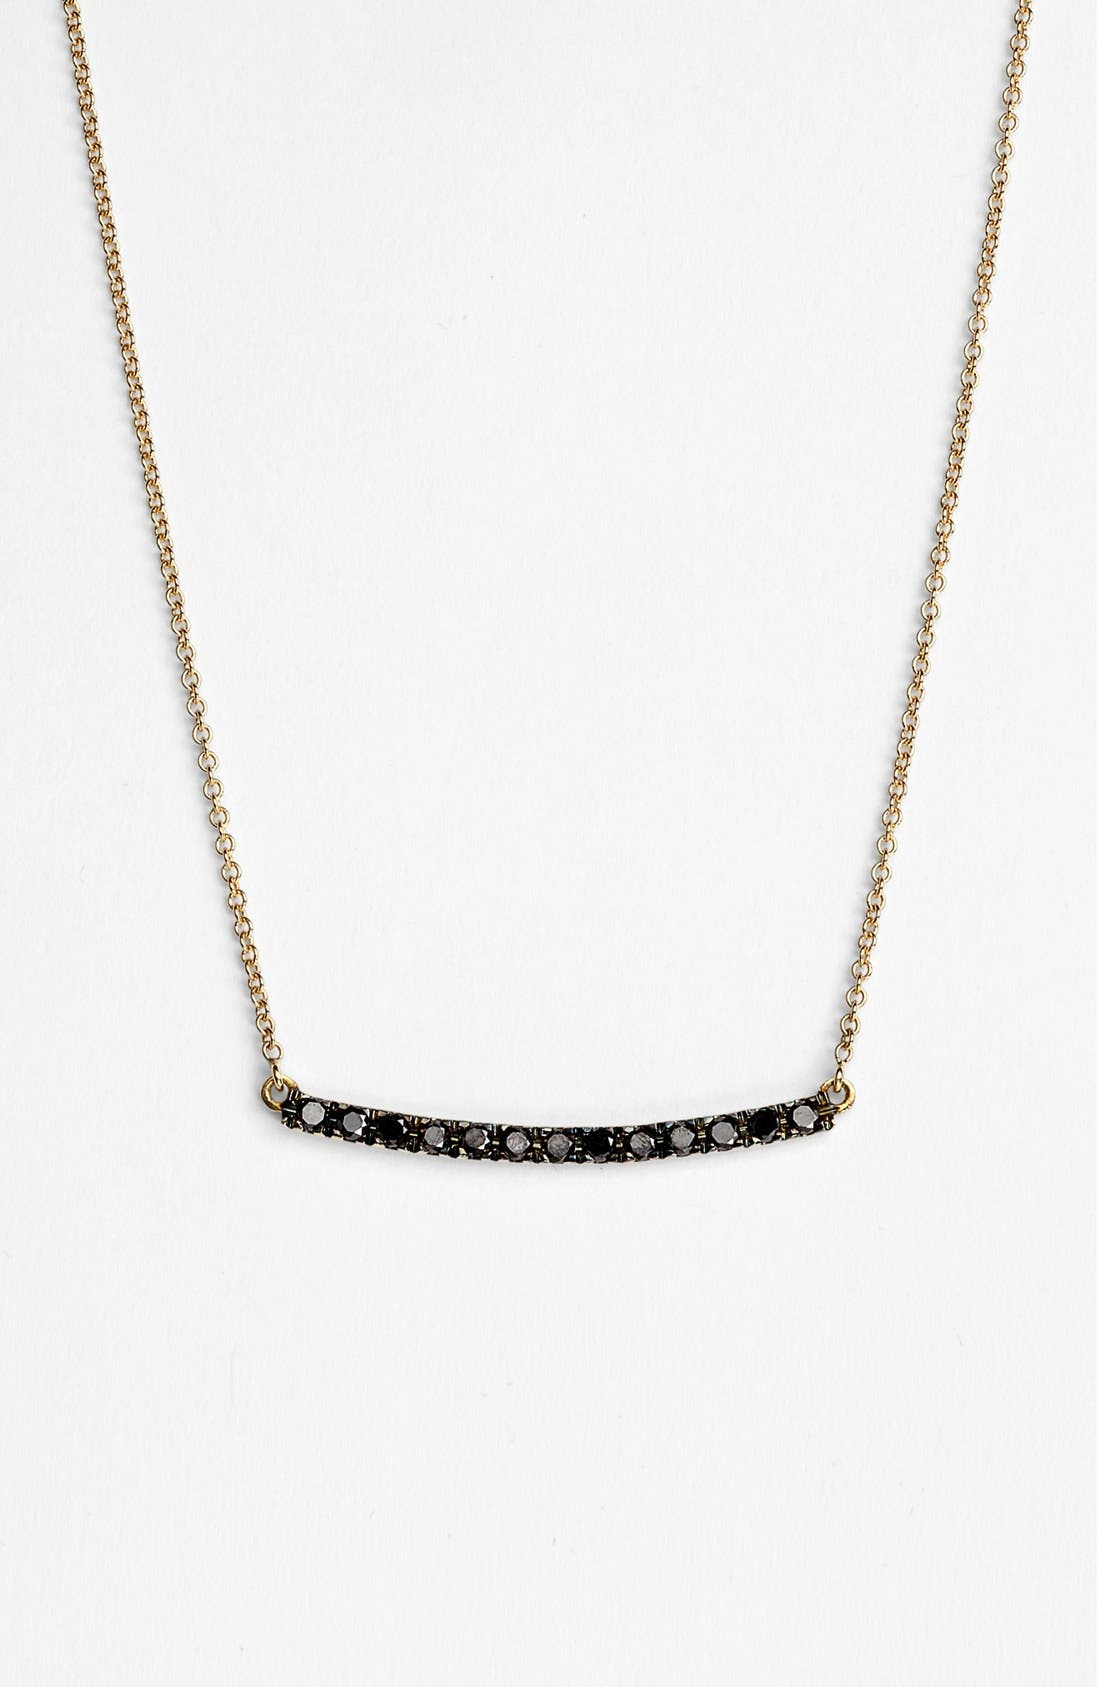 Main Image - Bony Levy 'Stick' Pavé Black Diamond Bar Necklace (Nordstrom Exclusive)